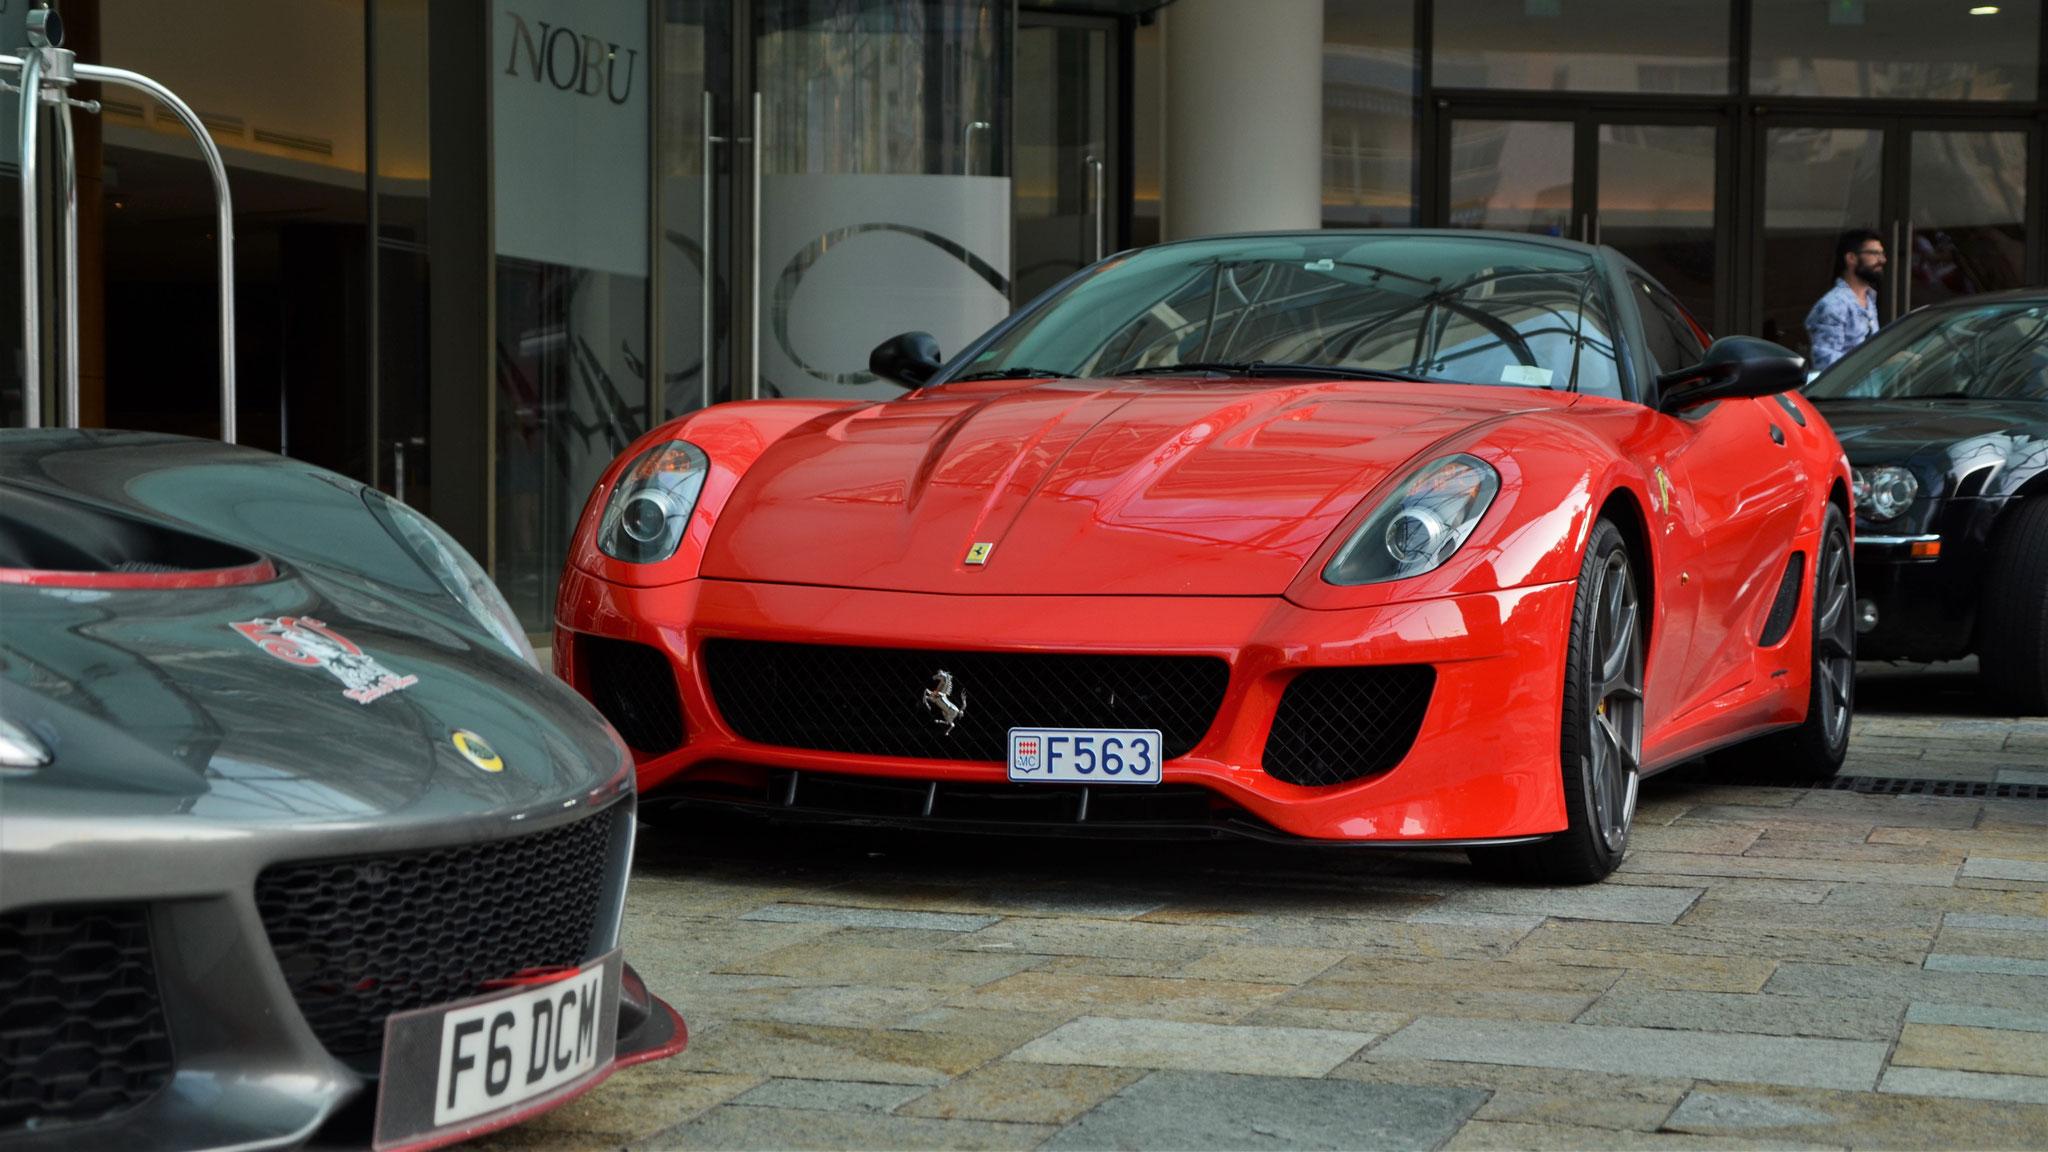 Ferrari 599 GTO (Fake) - F563 (MC)